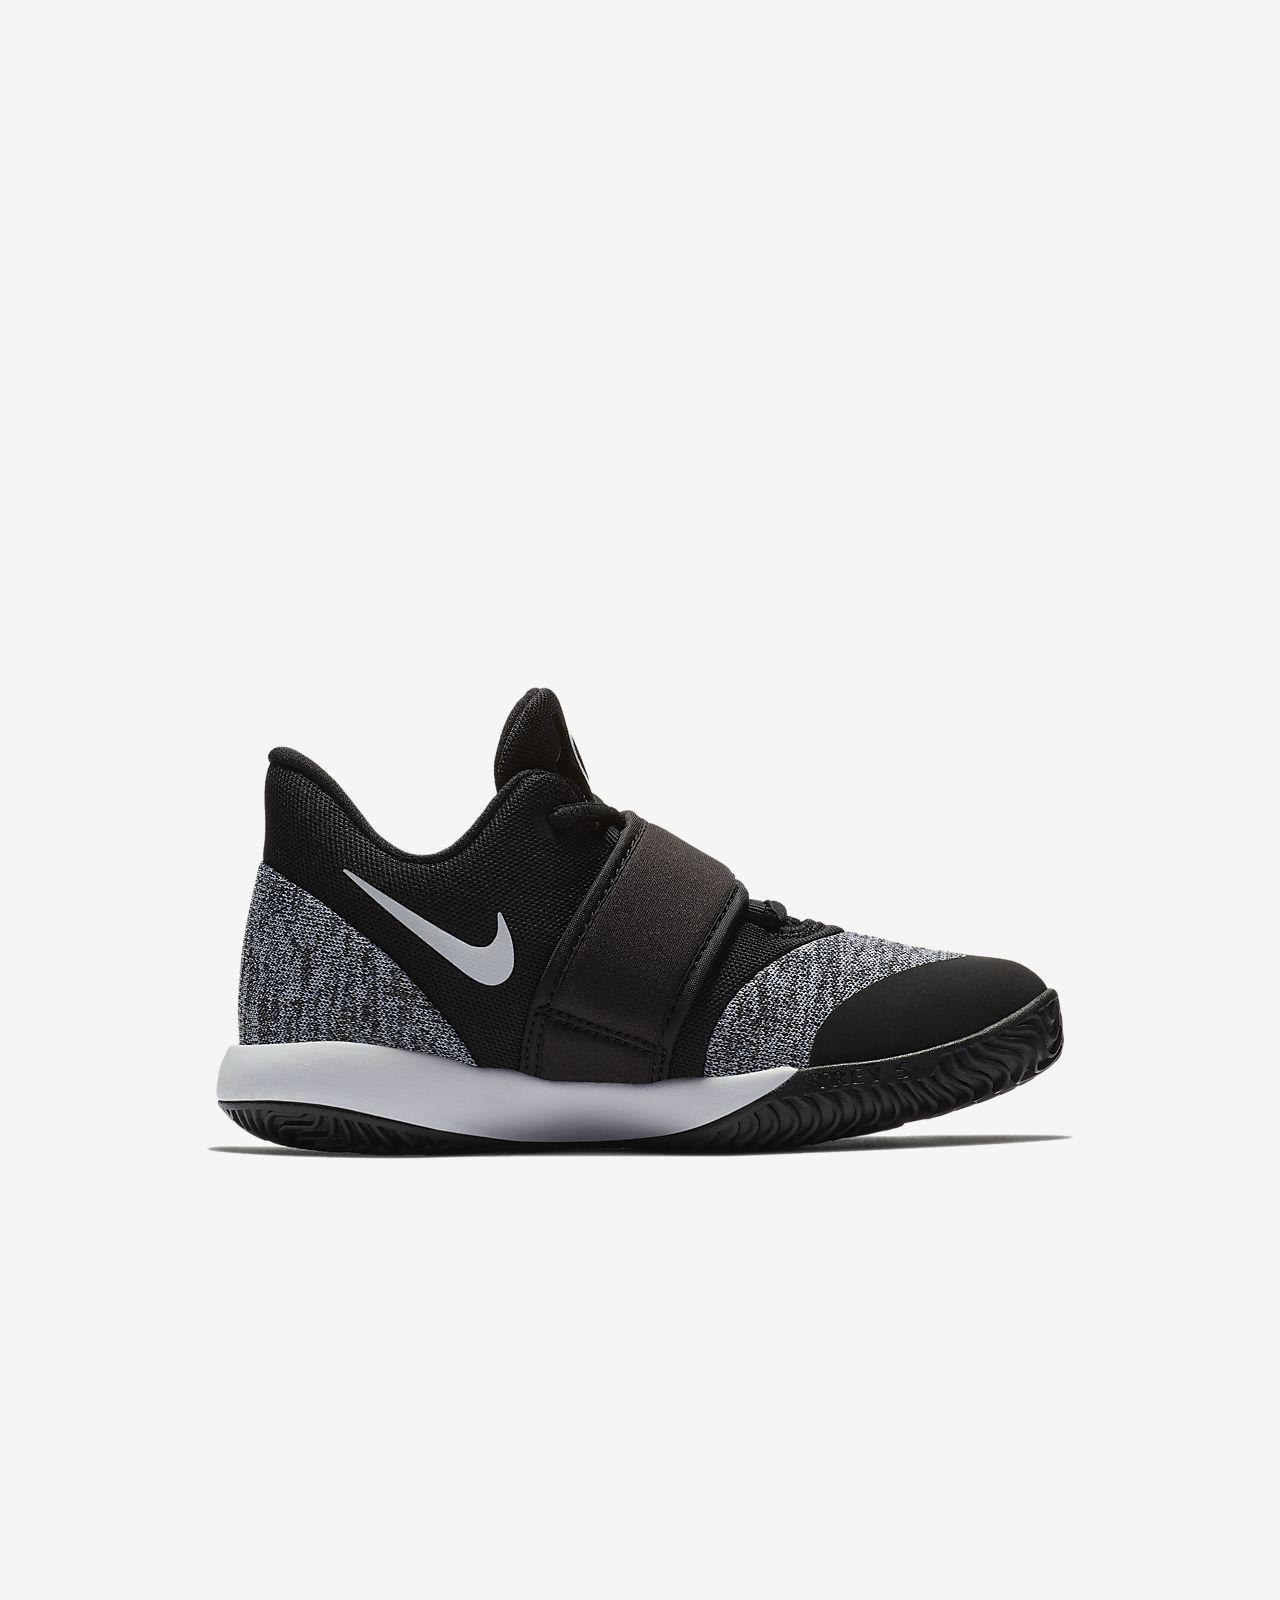 532086f5dbf4 Nike KD Trey 5 VI Little Kids  Basketball Shoe. Nike.com